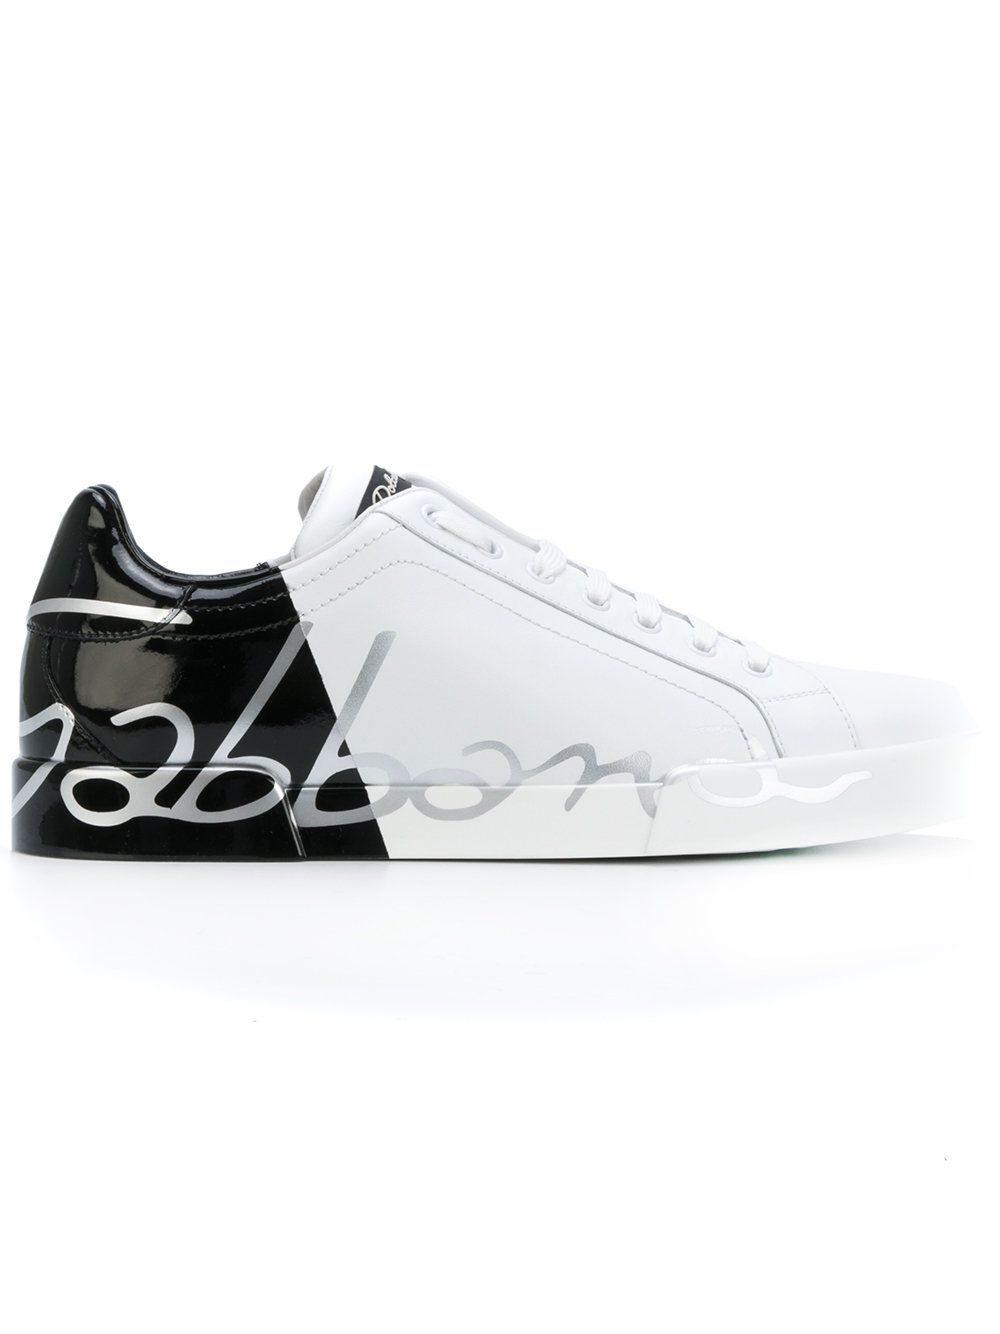 Dolce \u0026 Gabbana Portofino Sneakers